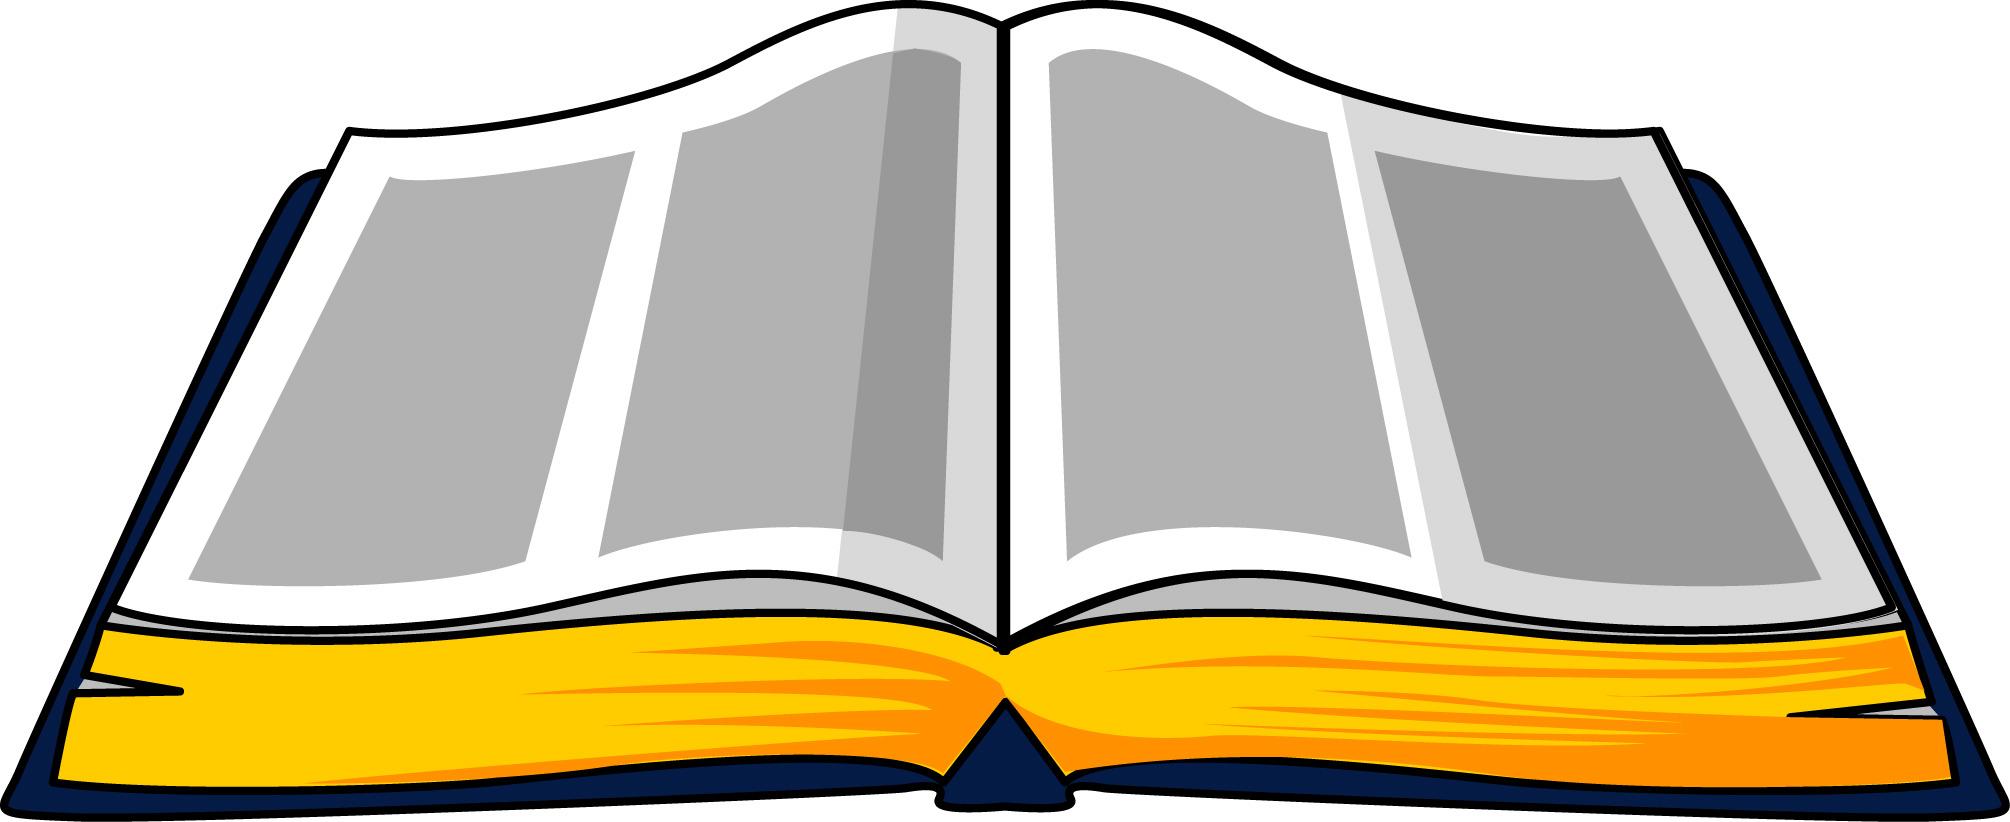 Bobook clipart open bible Clipart Bible Free Open clipart